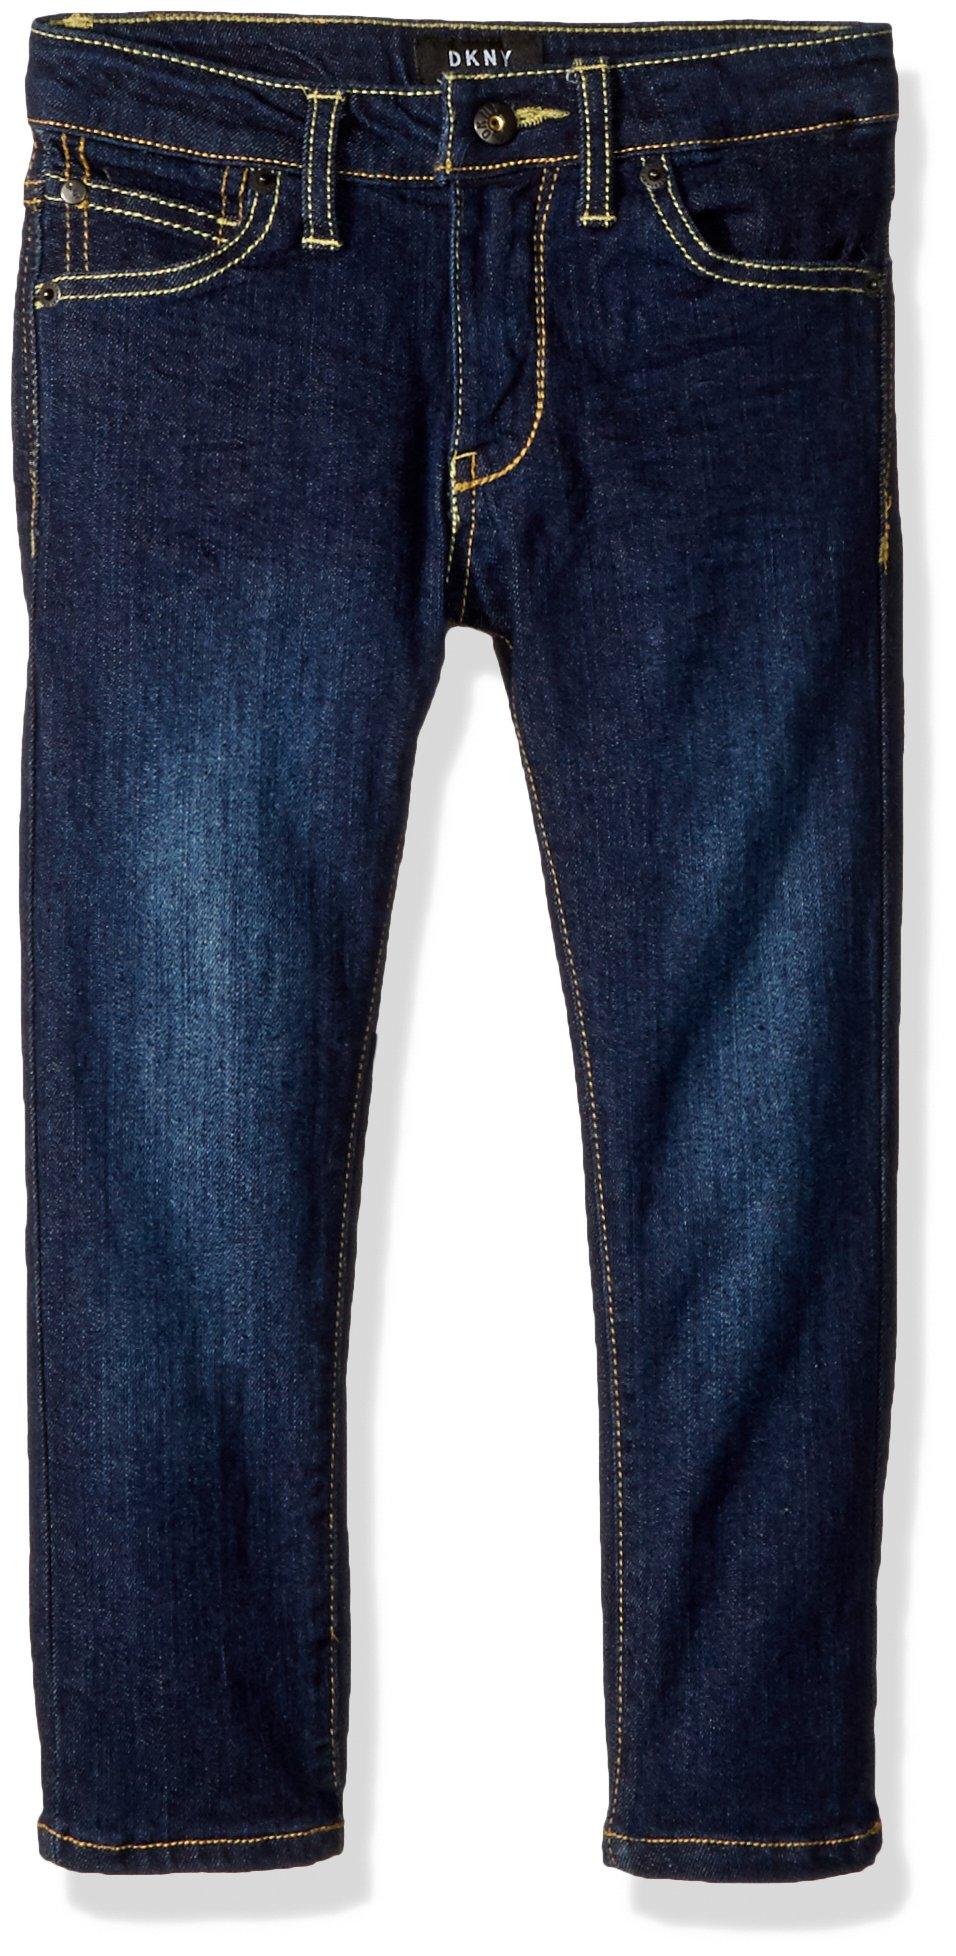 DKNY Little Boys' Mott Straight Fit Stretch Denim Jean, Dark Indigo, 7